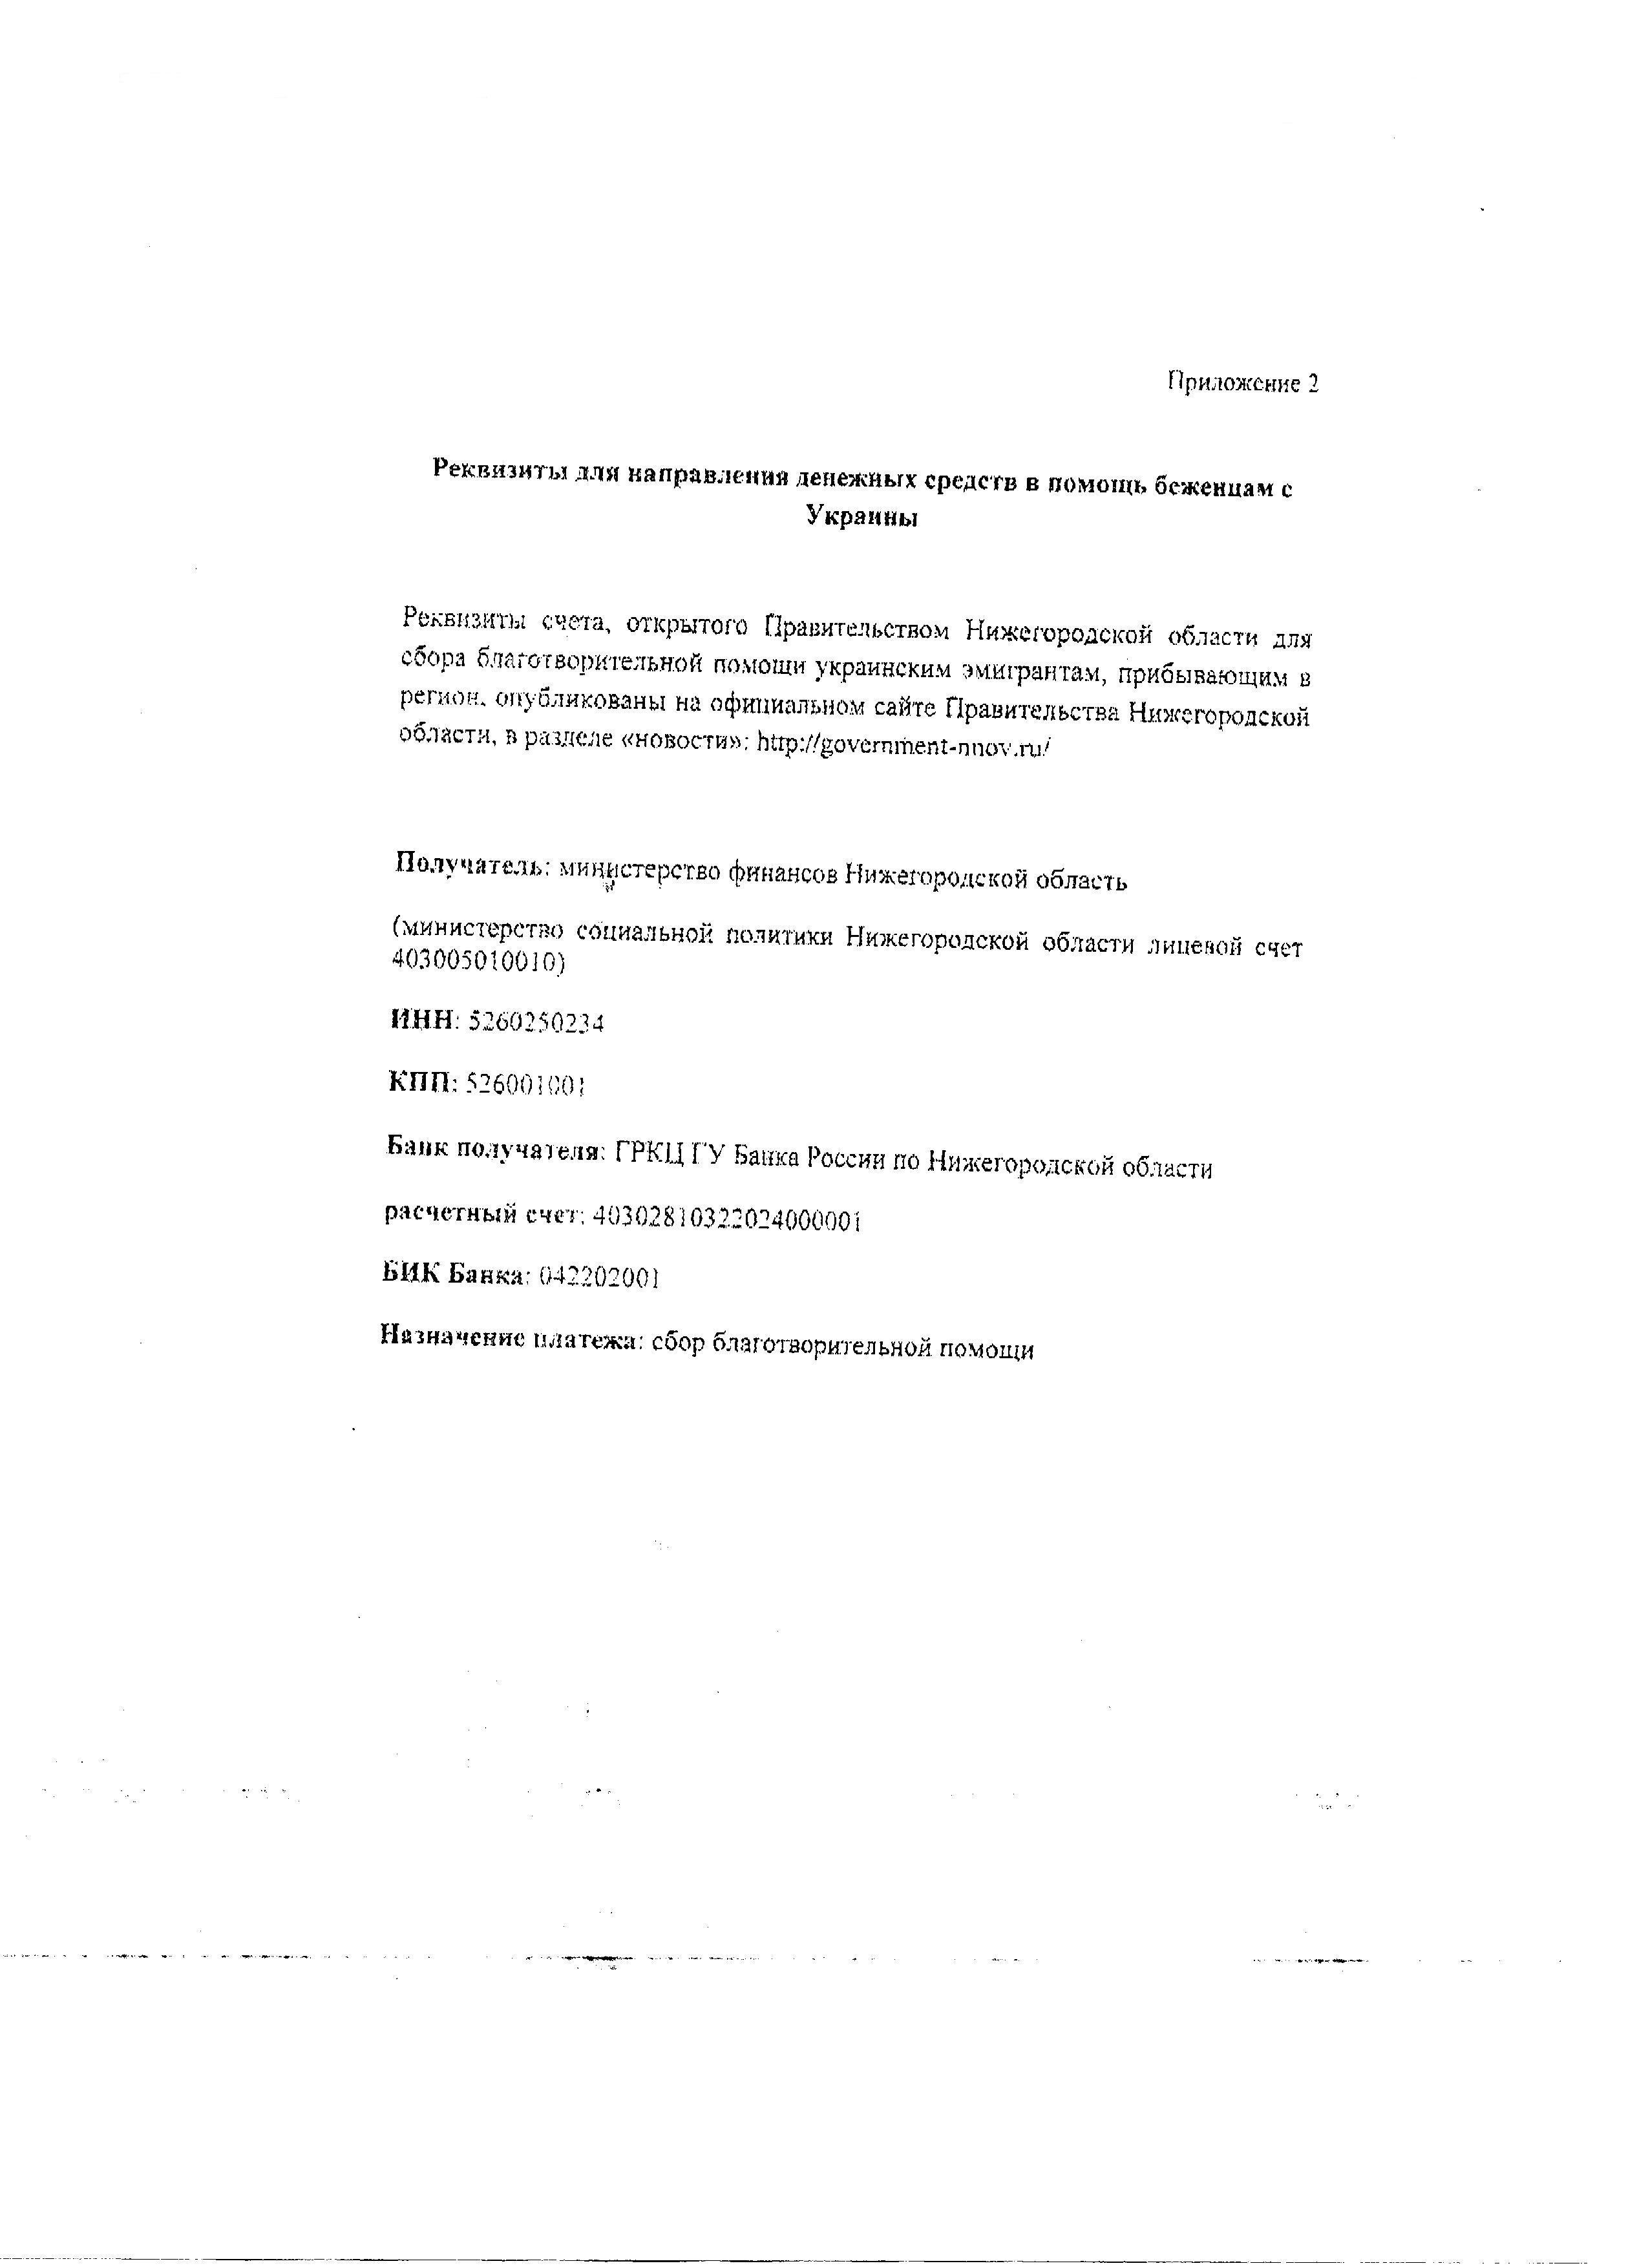 Реквизиты Украина